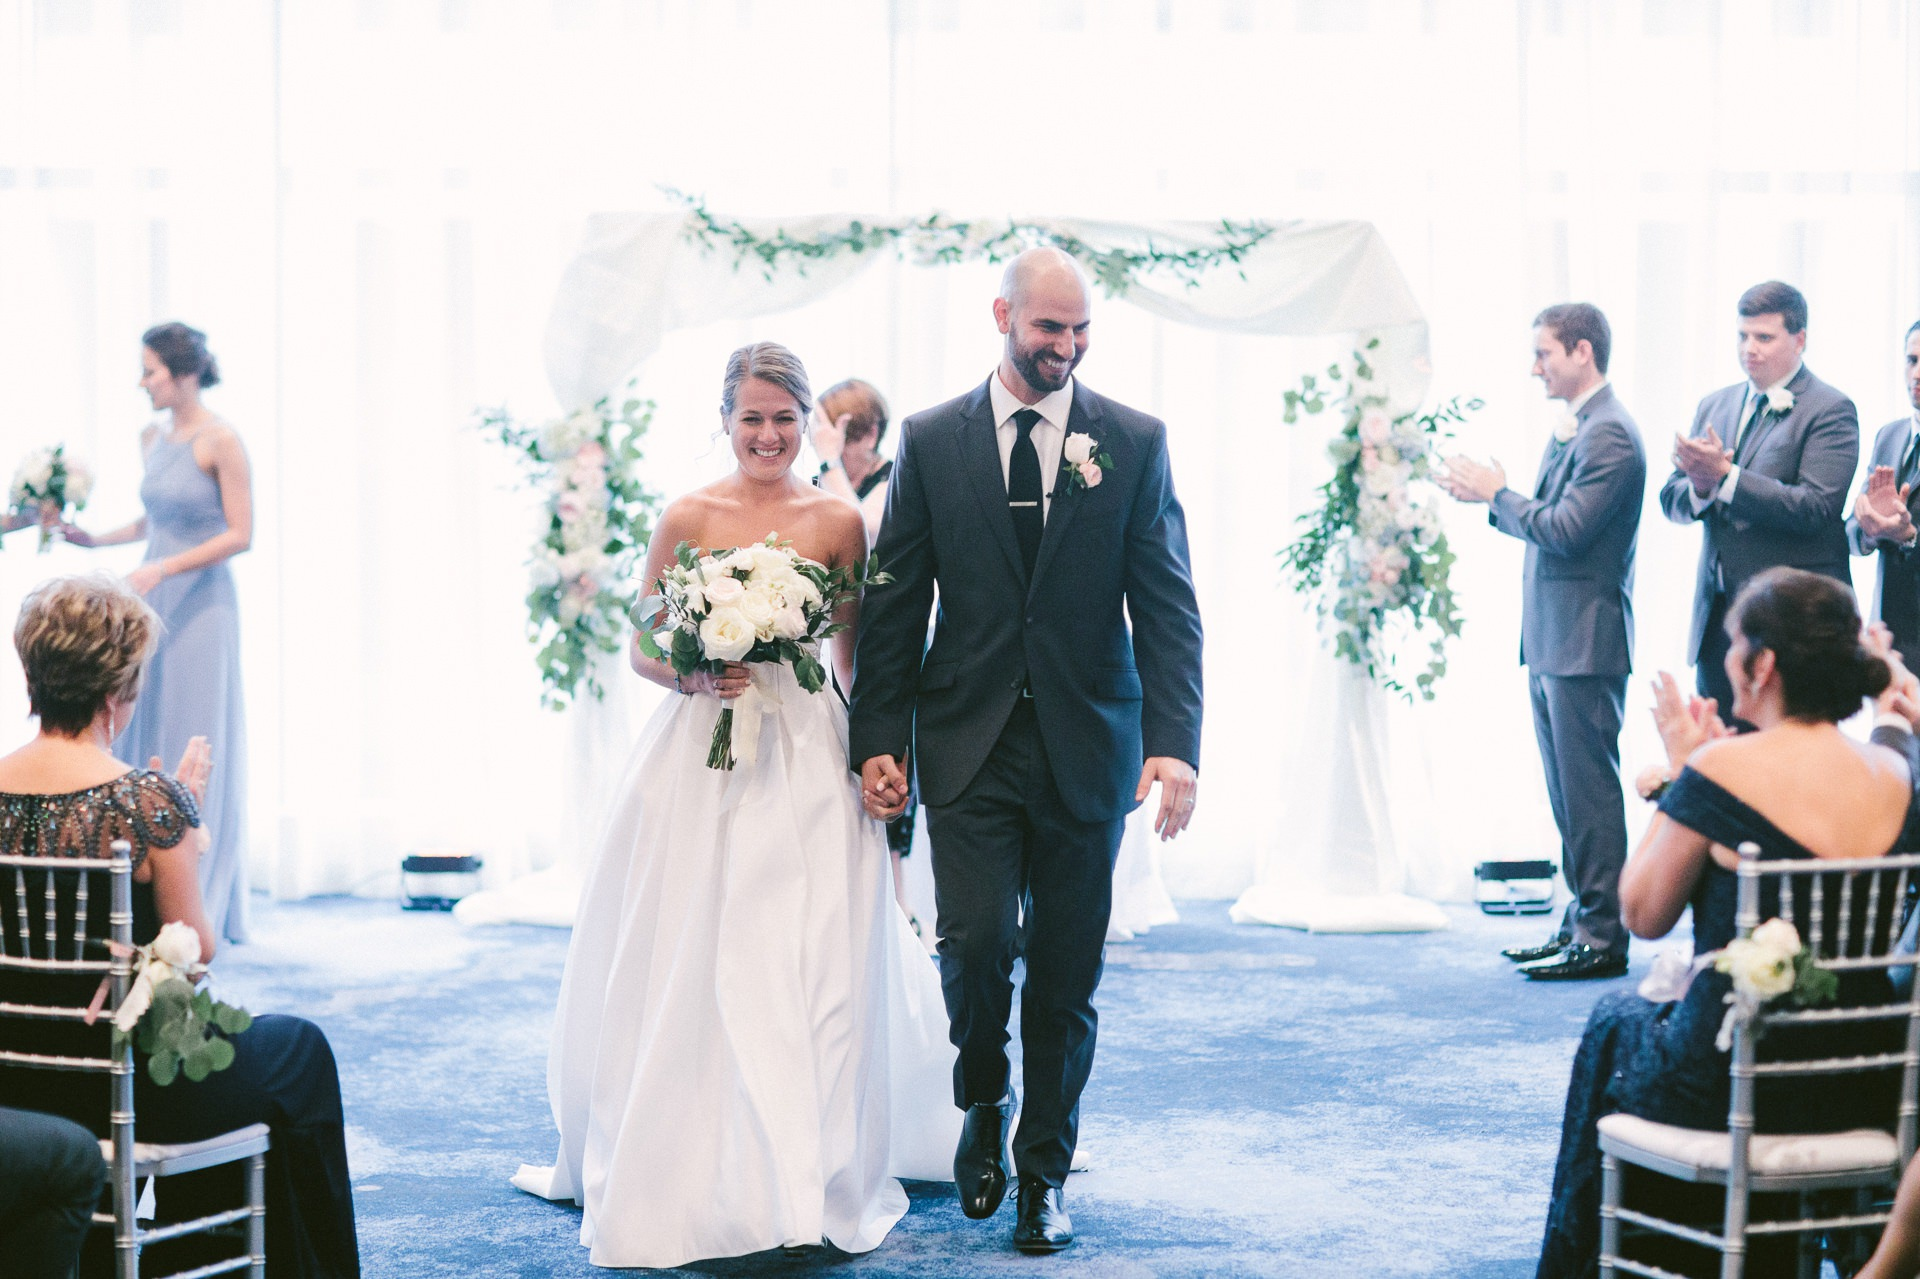 Dowtown Hilton Cleveland Wedding Photographer 2 16.jpg